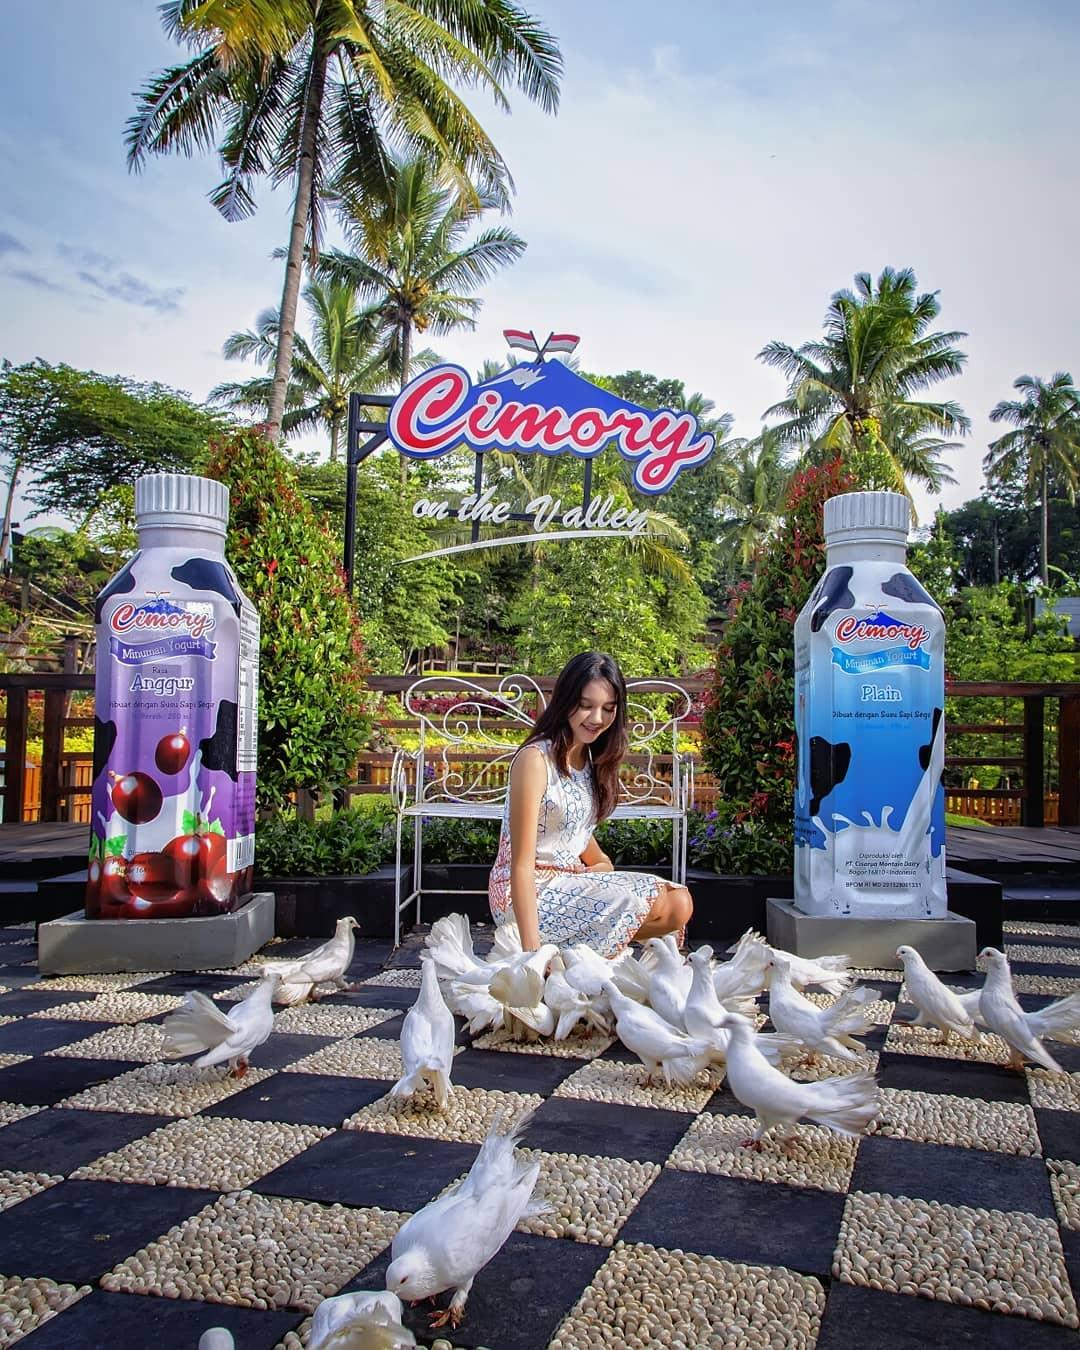 Cimory Semarang, Wisata Keluarga Seru di Bawen Semarang! - Indwisata